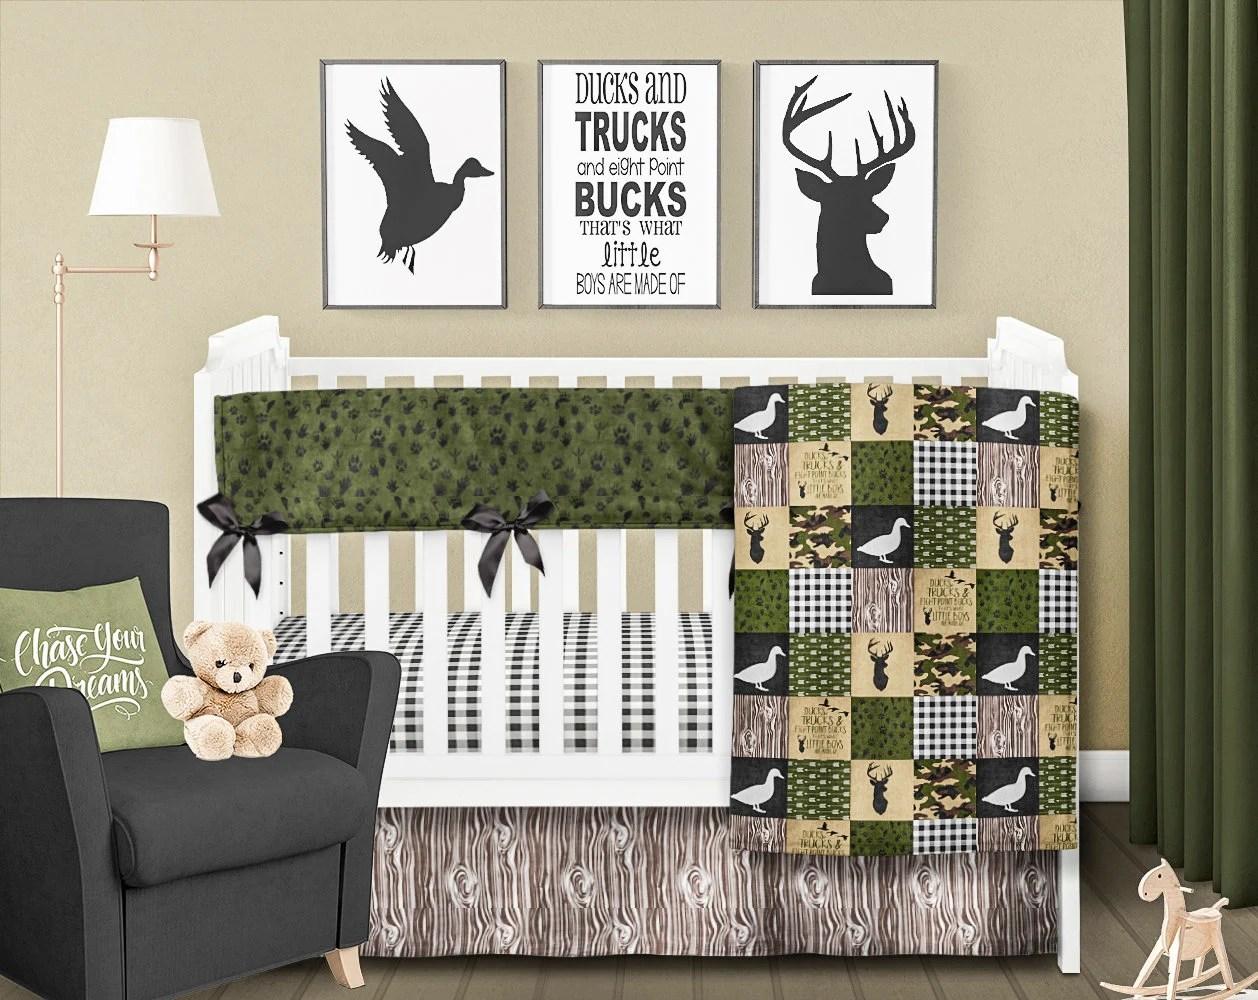 duck baby blanket rustic nursery bedding boy crib bedding set deer crib quilt hunting baby blanket green brown tan baby boy blanket